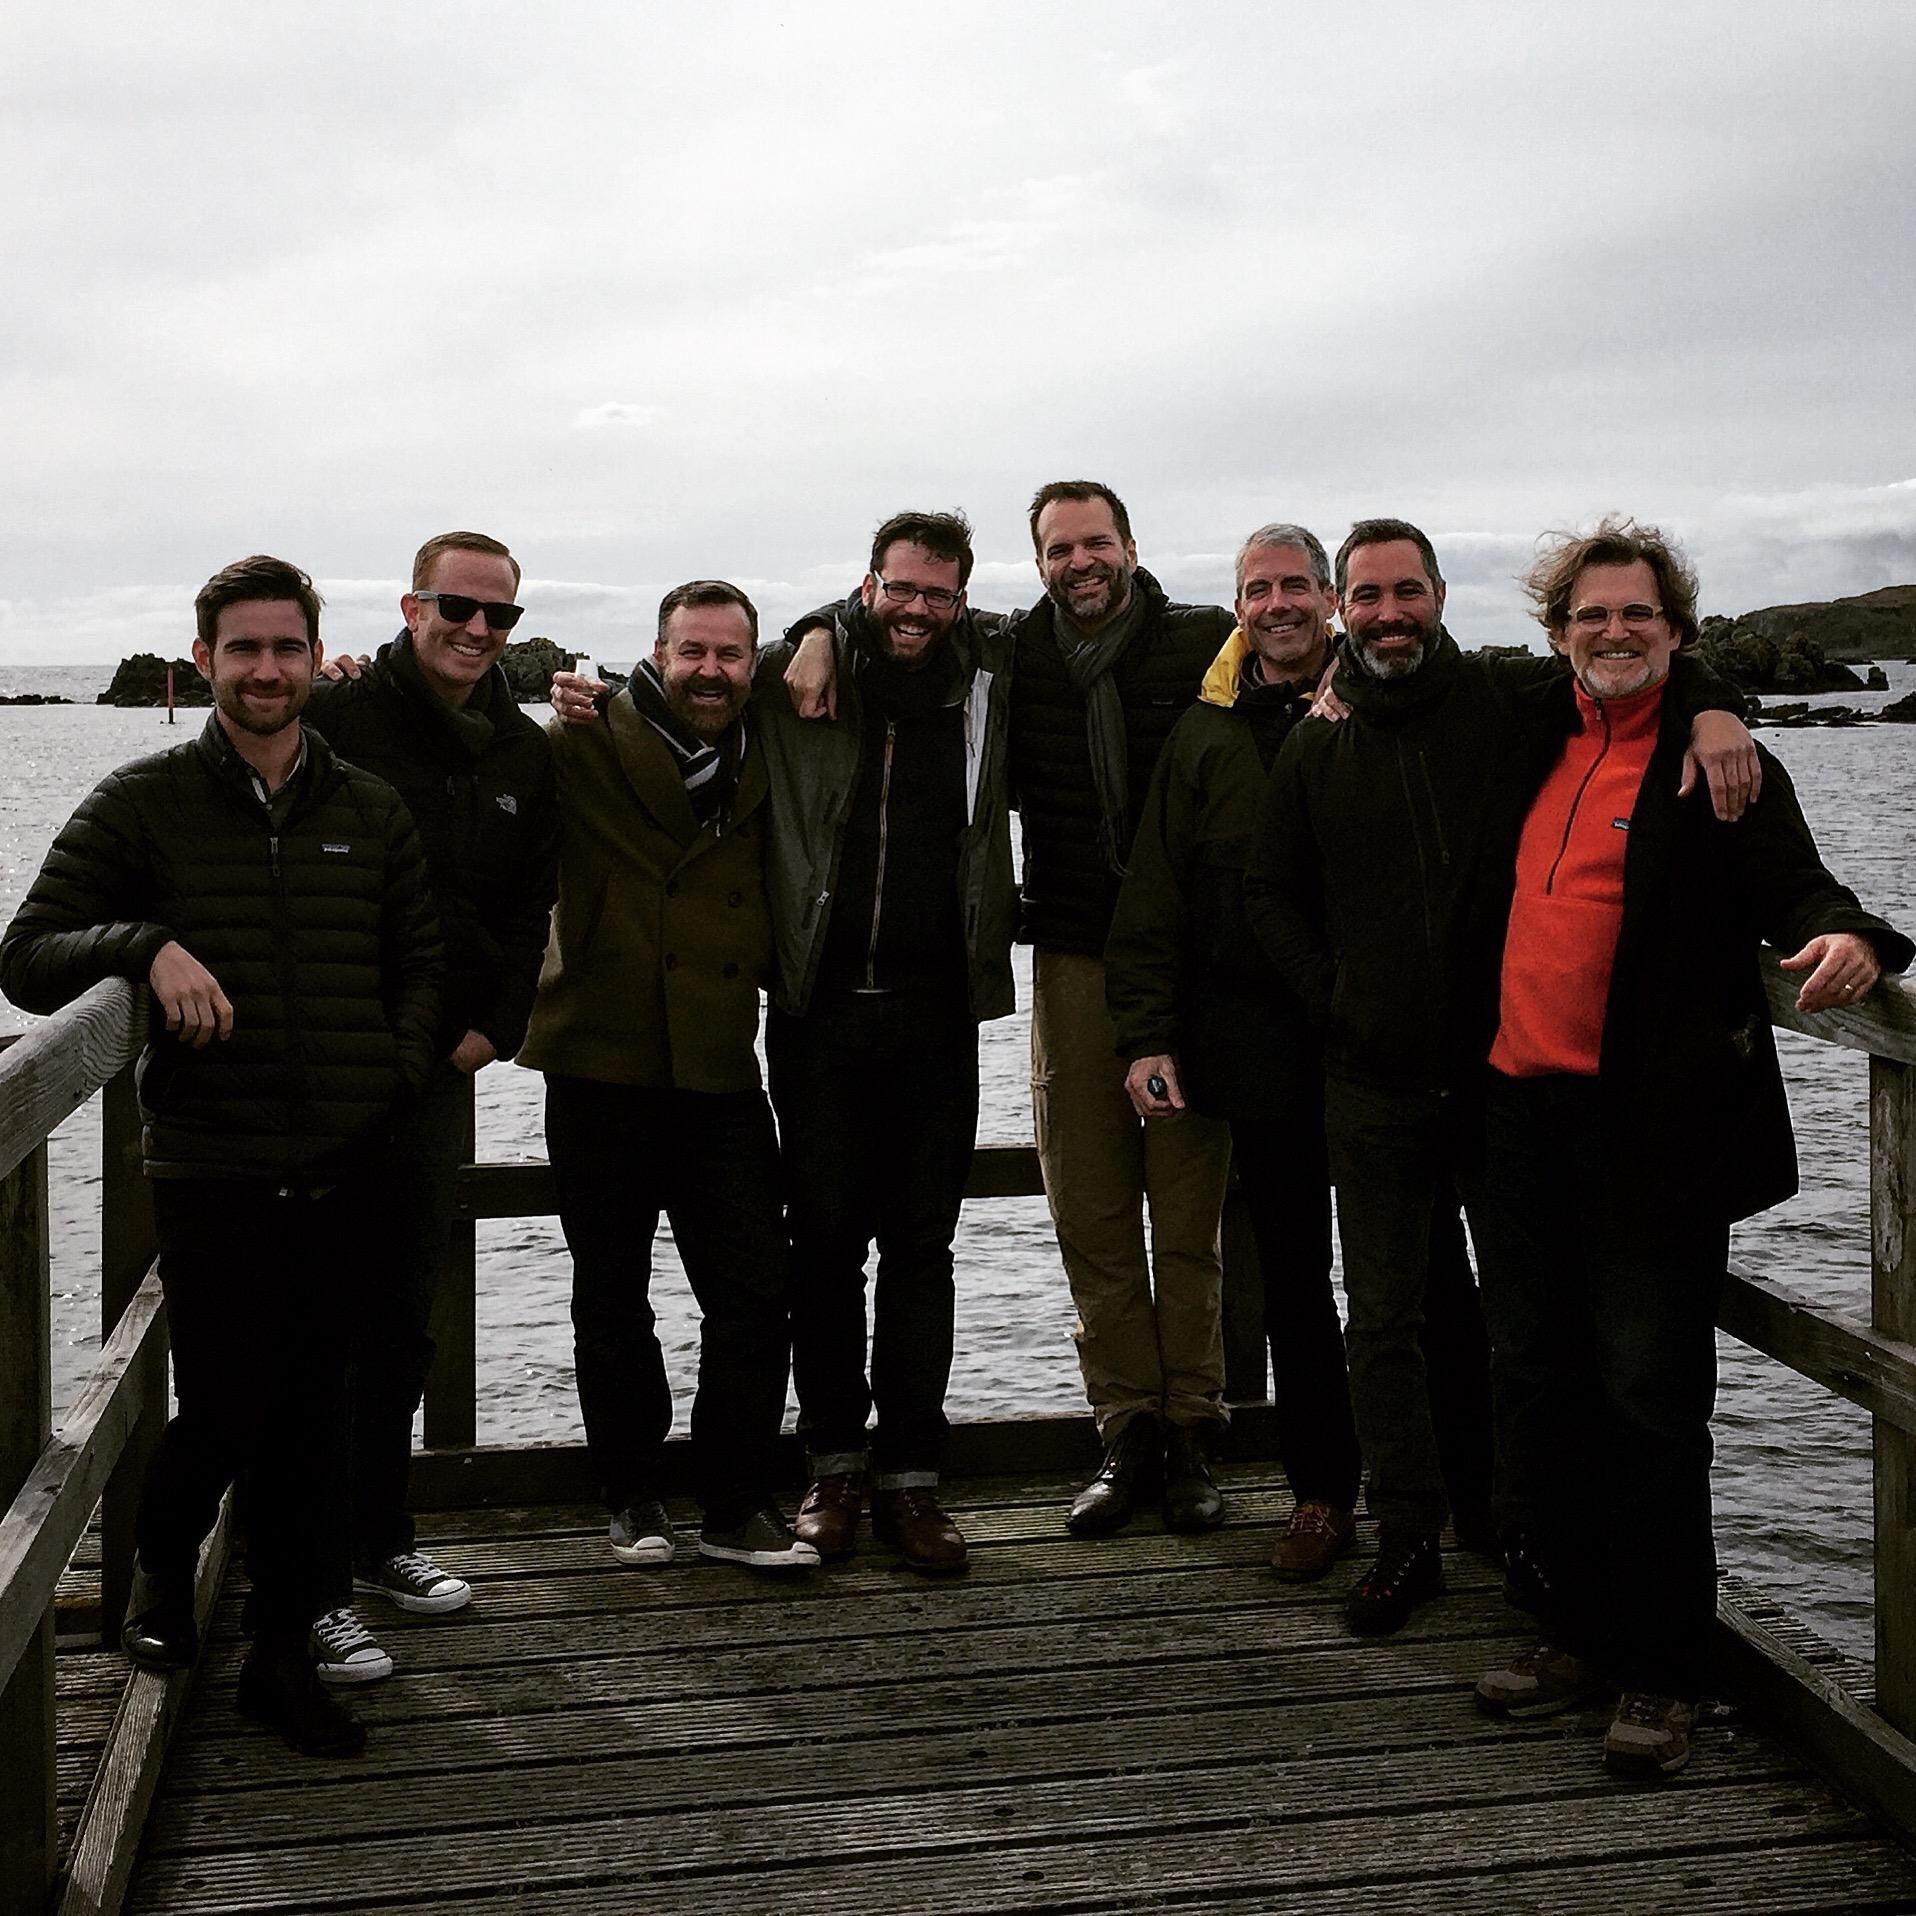 The Gents at Ardbeg Distillery